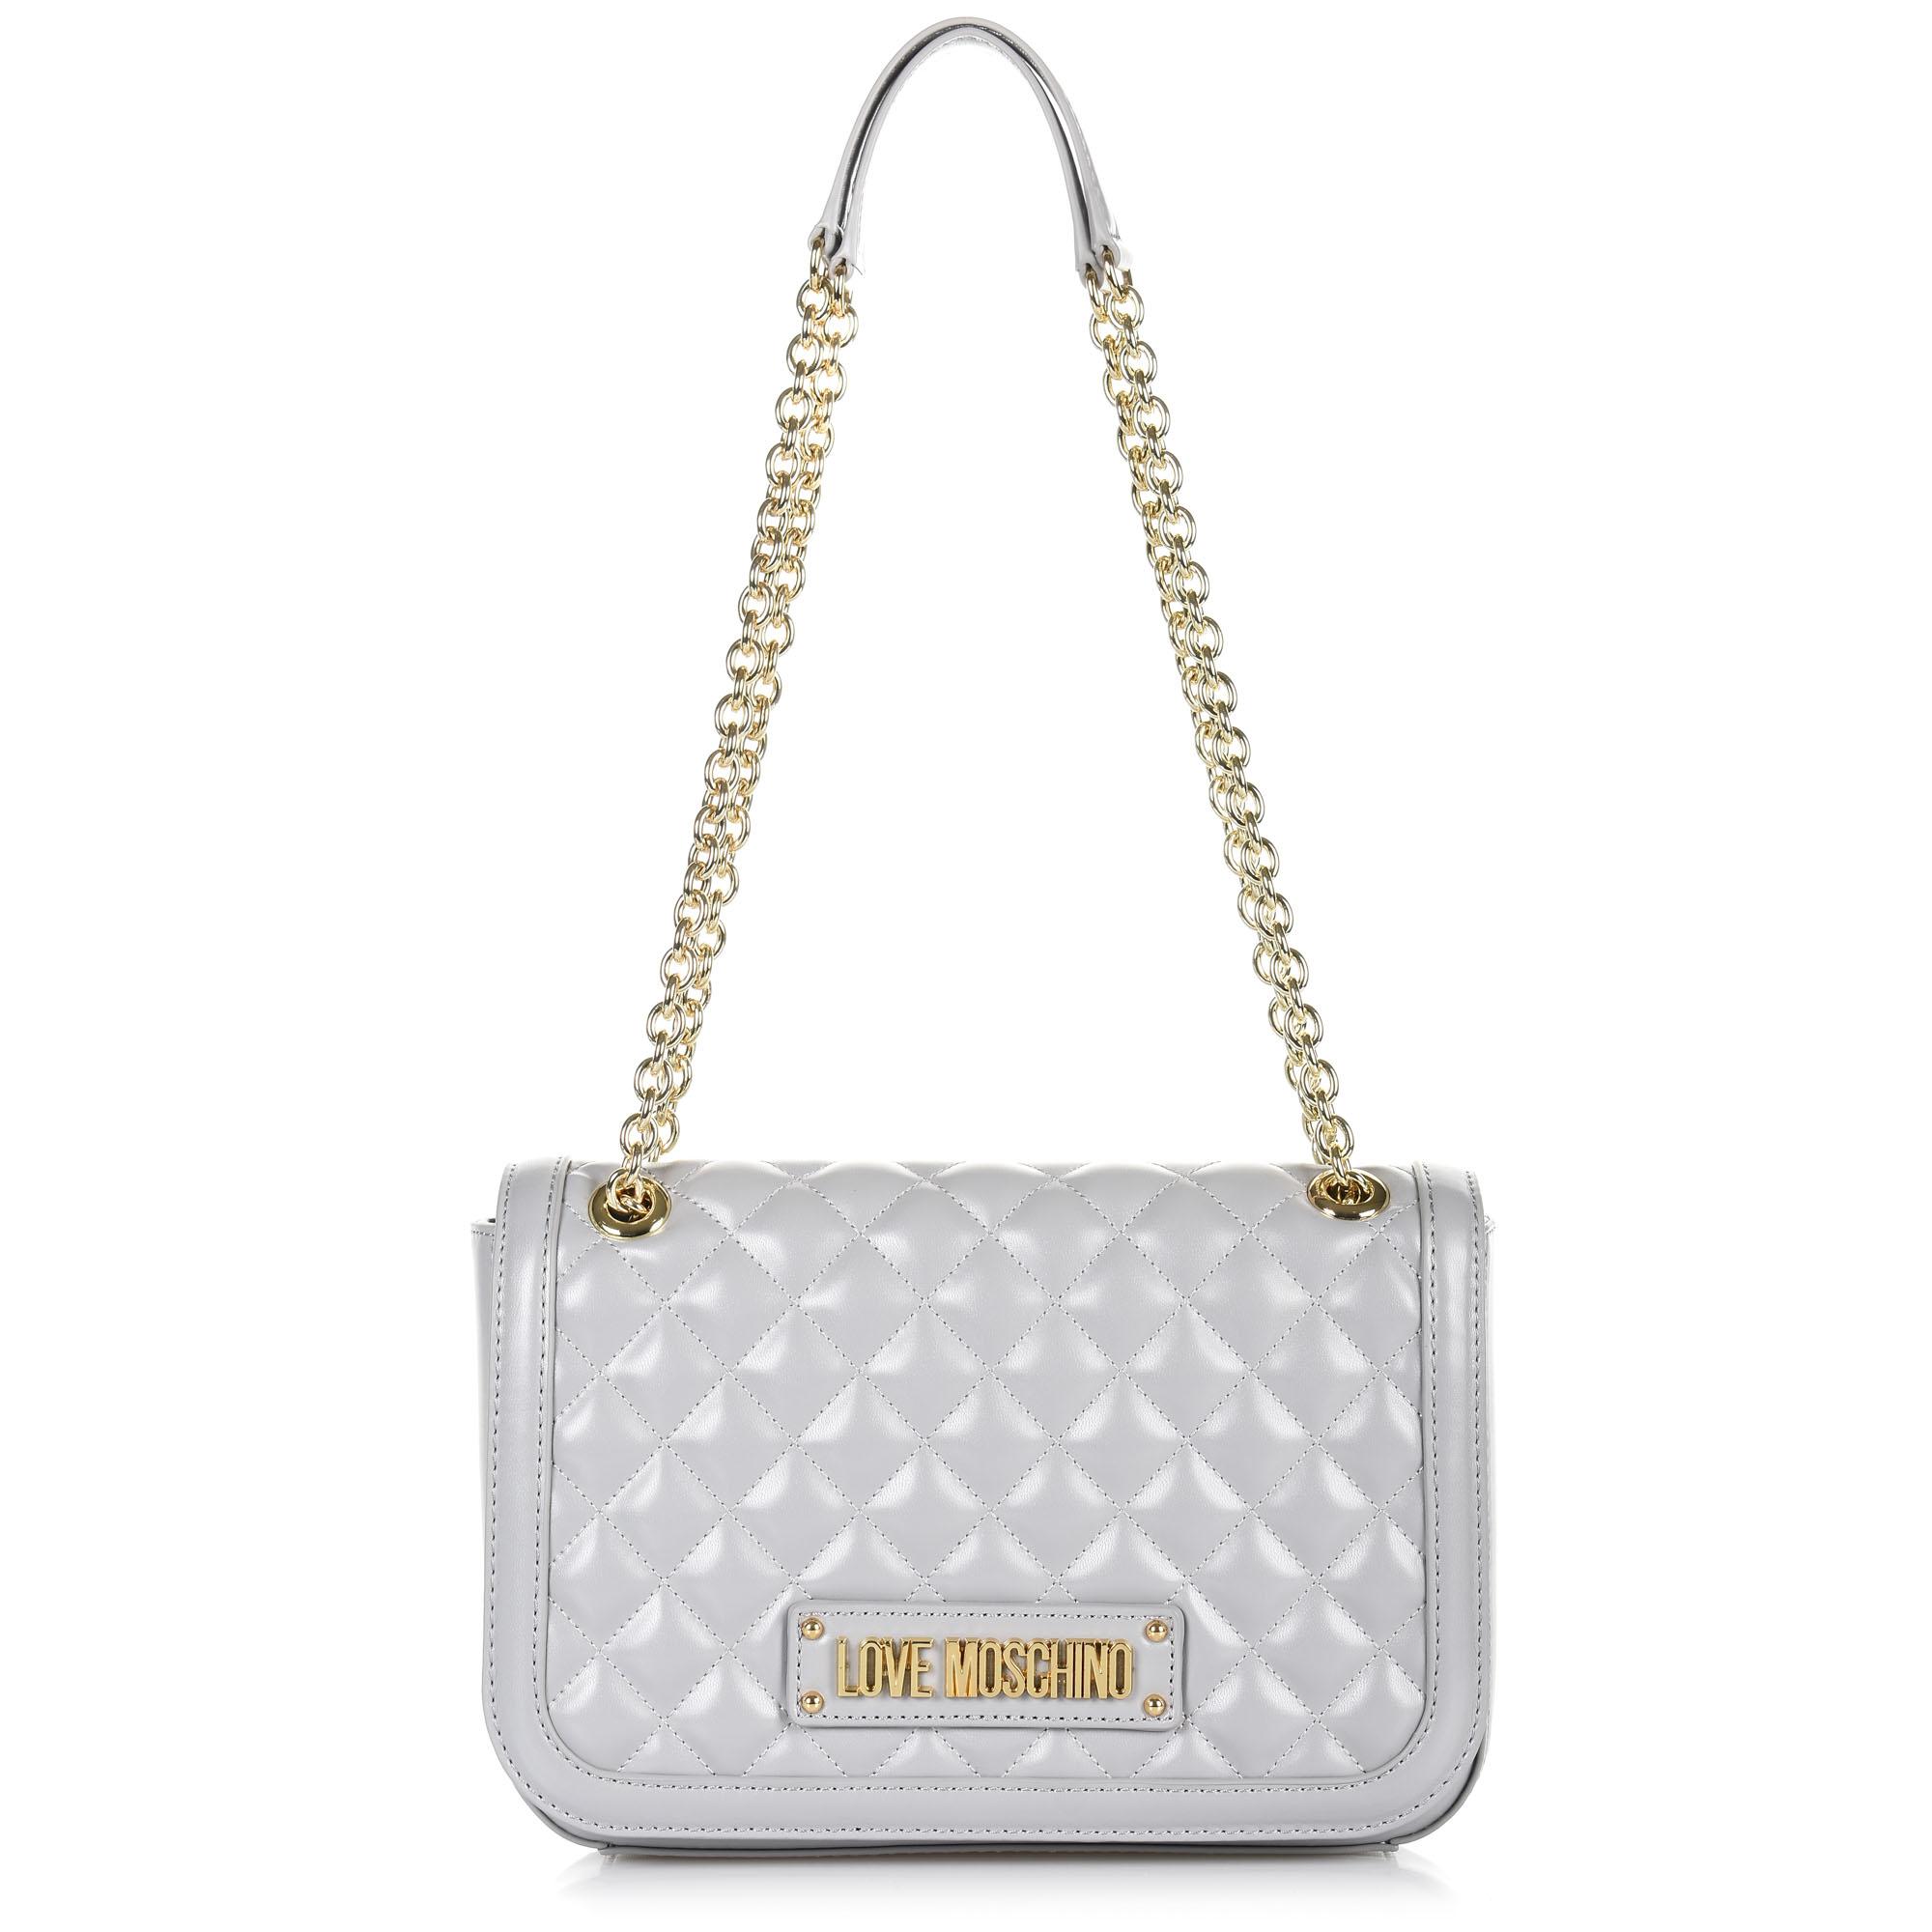 Brand Bags Τσάντα Ώμου Love Moschino JC4003PP17LA edeeccd4fc4